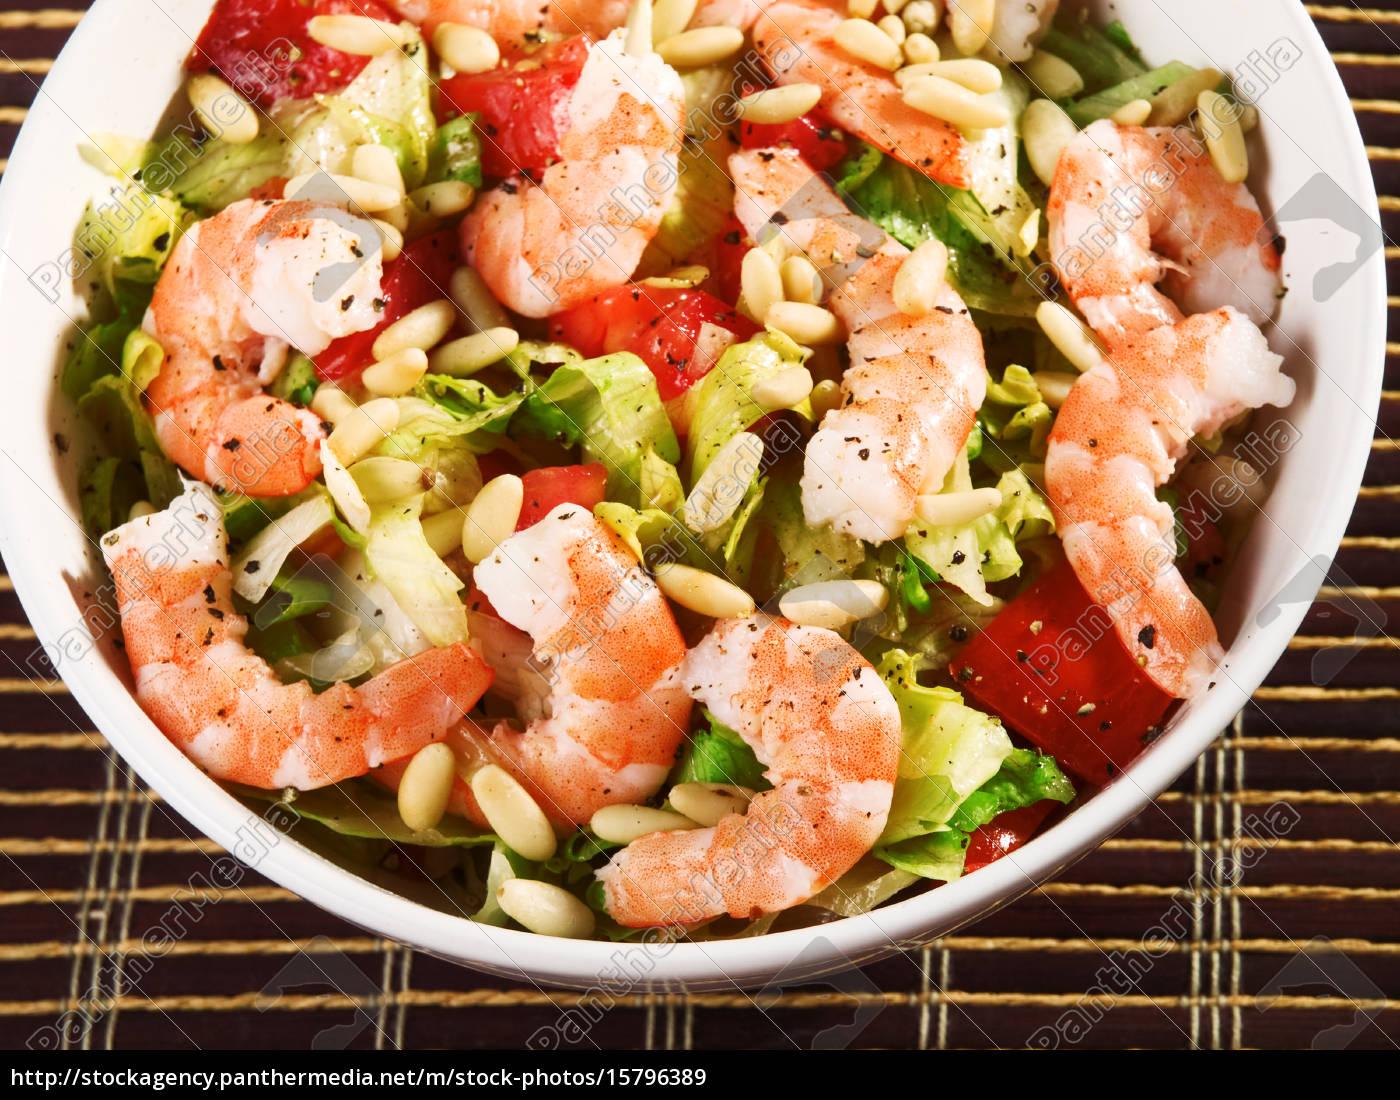 shrimps, salad, shrimps, salad, shrimps, salad, shrimps, salad, shrimps, salad, shrimps - 15796389